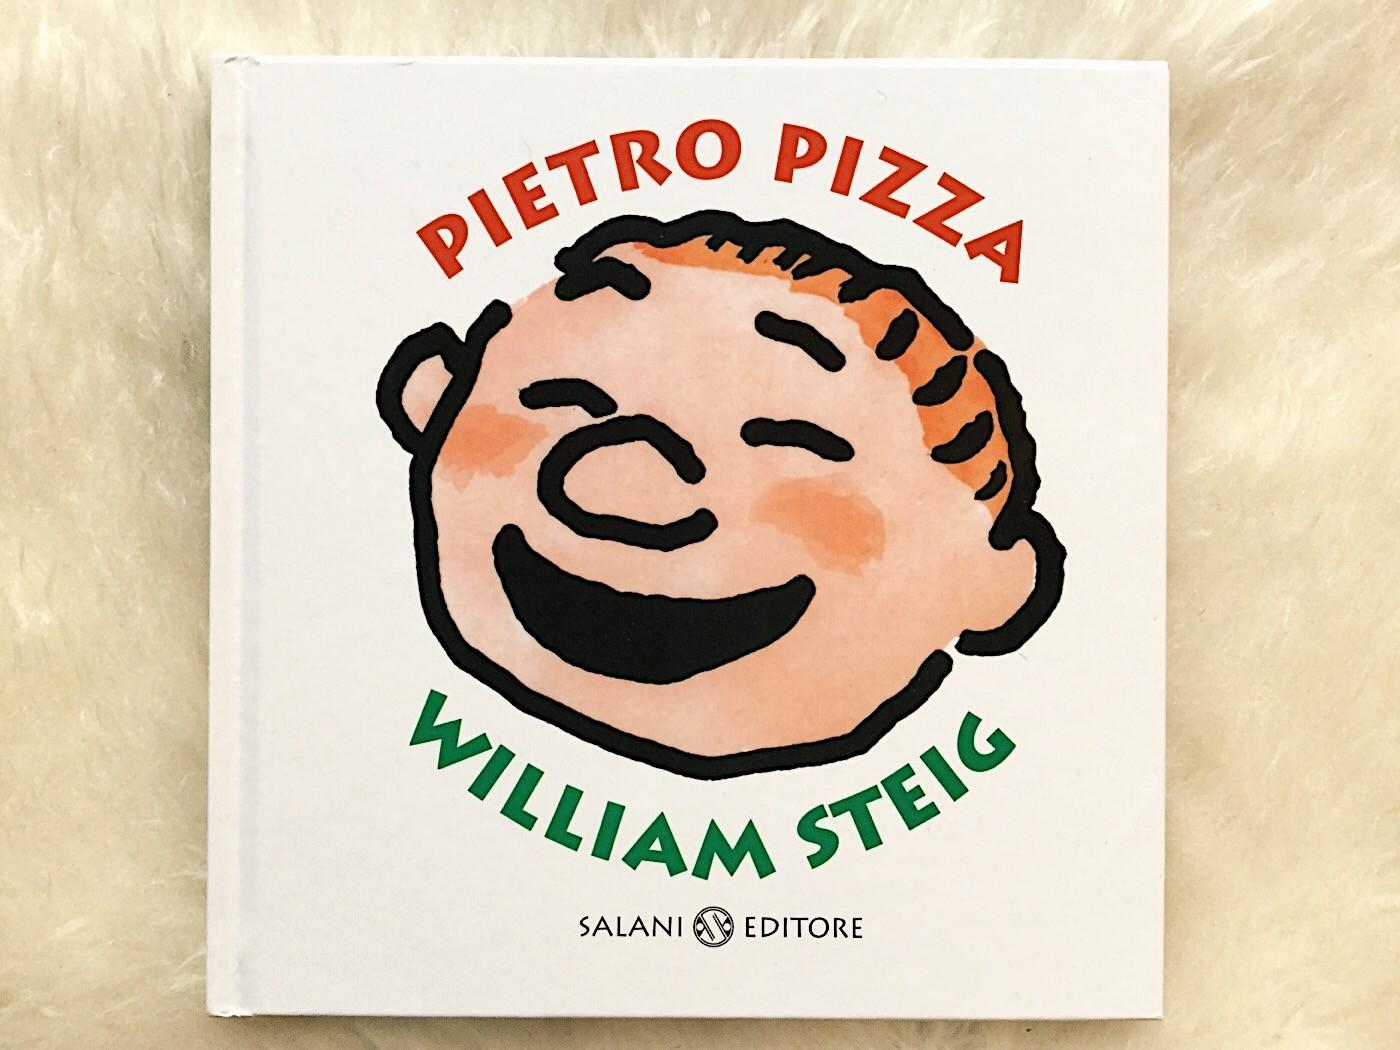 Pietro-Pizza-William-Steig-Salani-Galline-Volanti